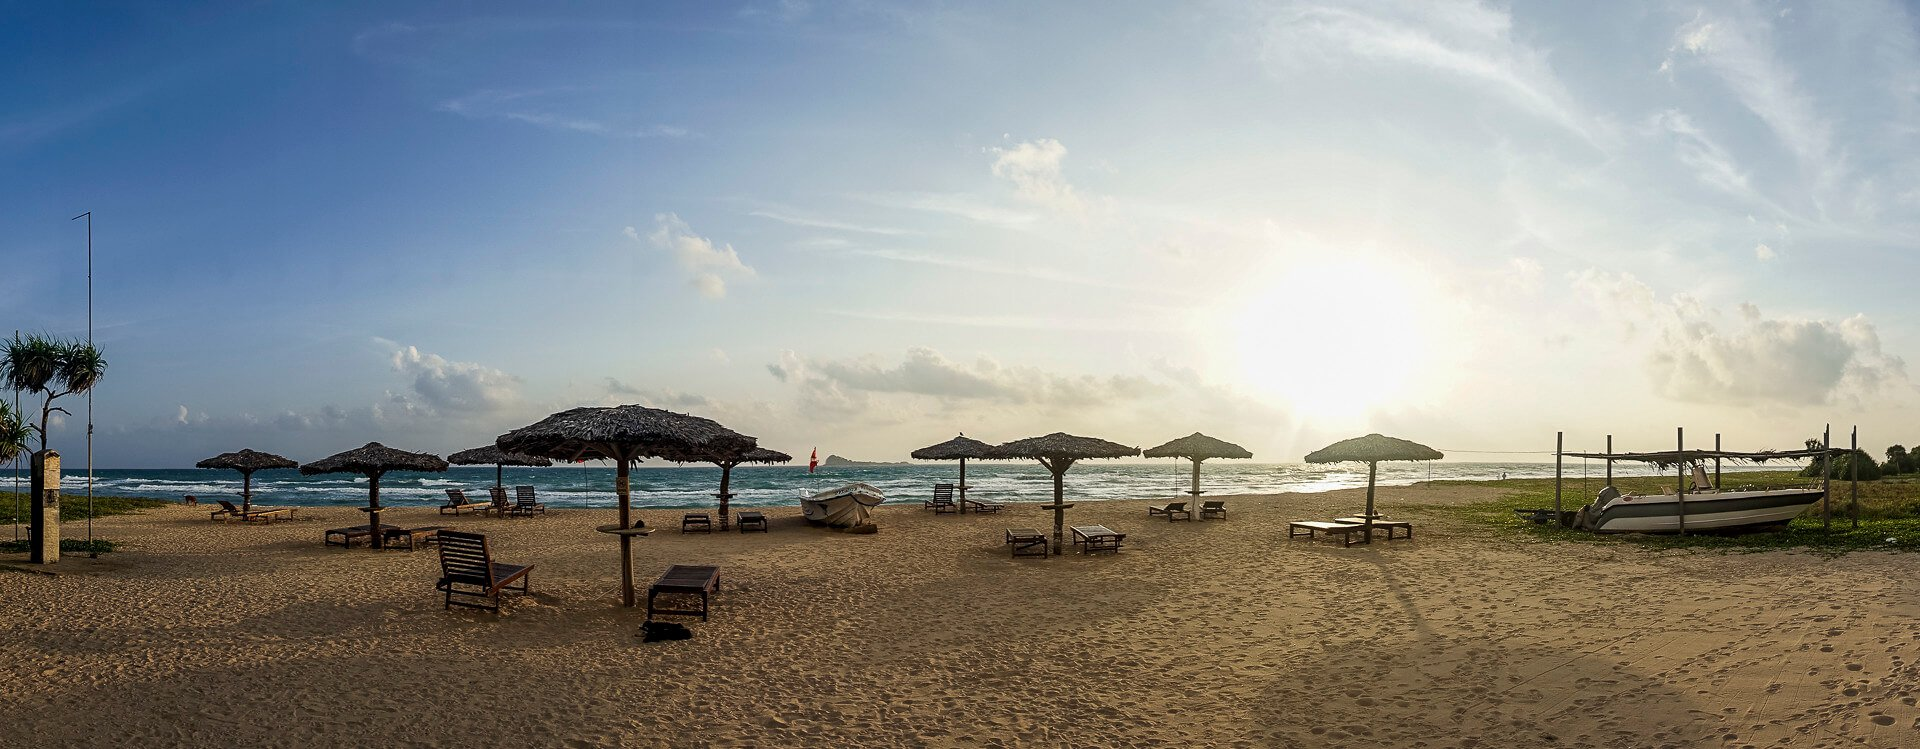 Quiet Sri Lankan tourist beach near Trincomalee at Nilaveli